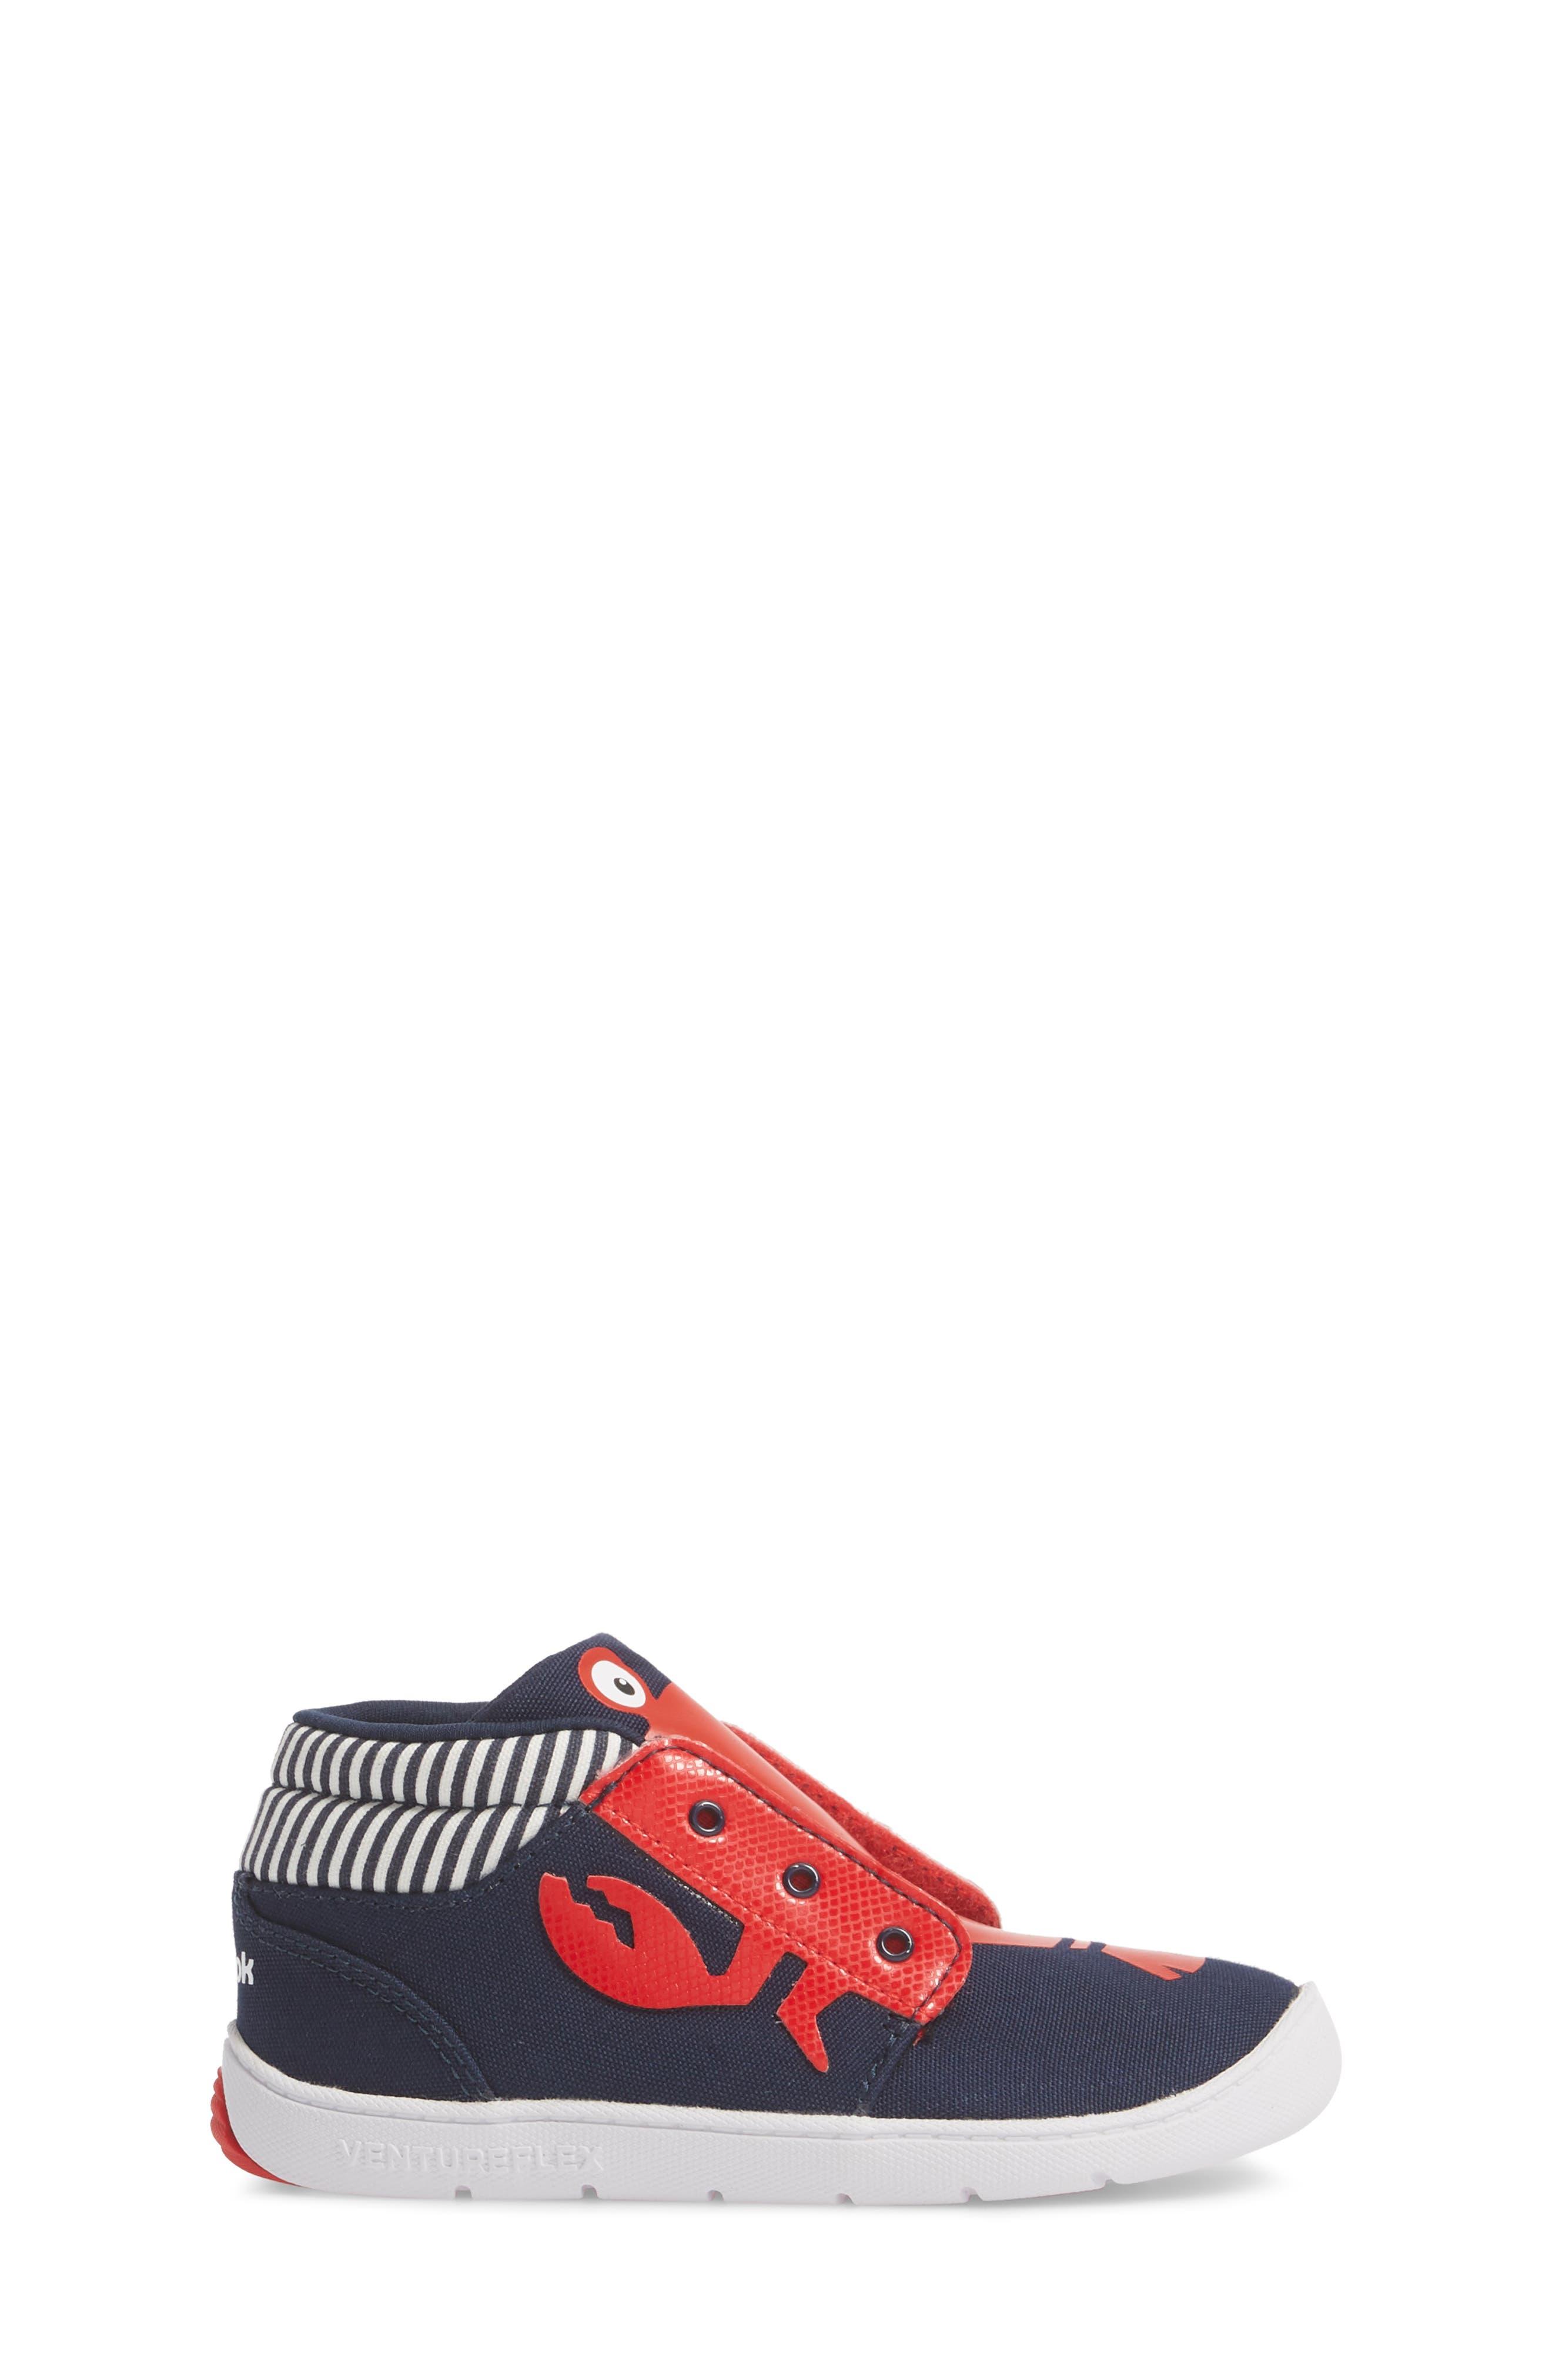 Ventureflex High Top Critter Sneaker,                             Alternate thumbnail 3, color,                             400